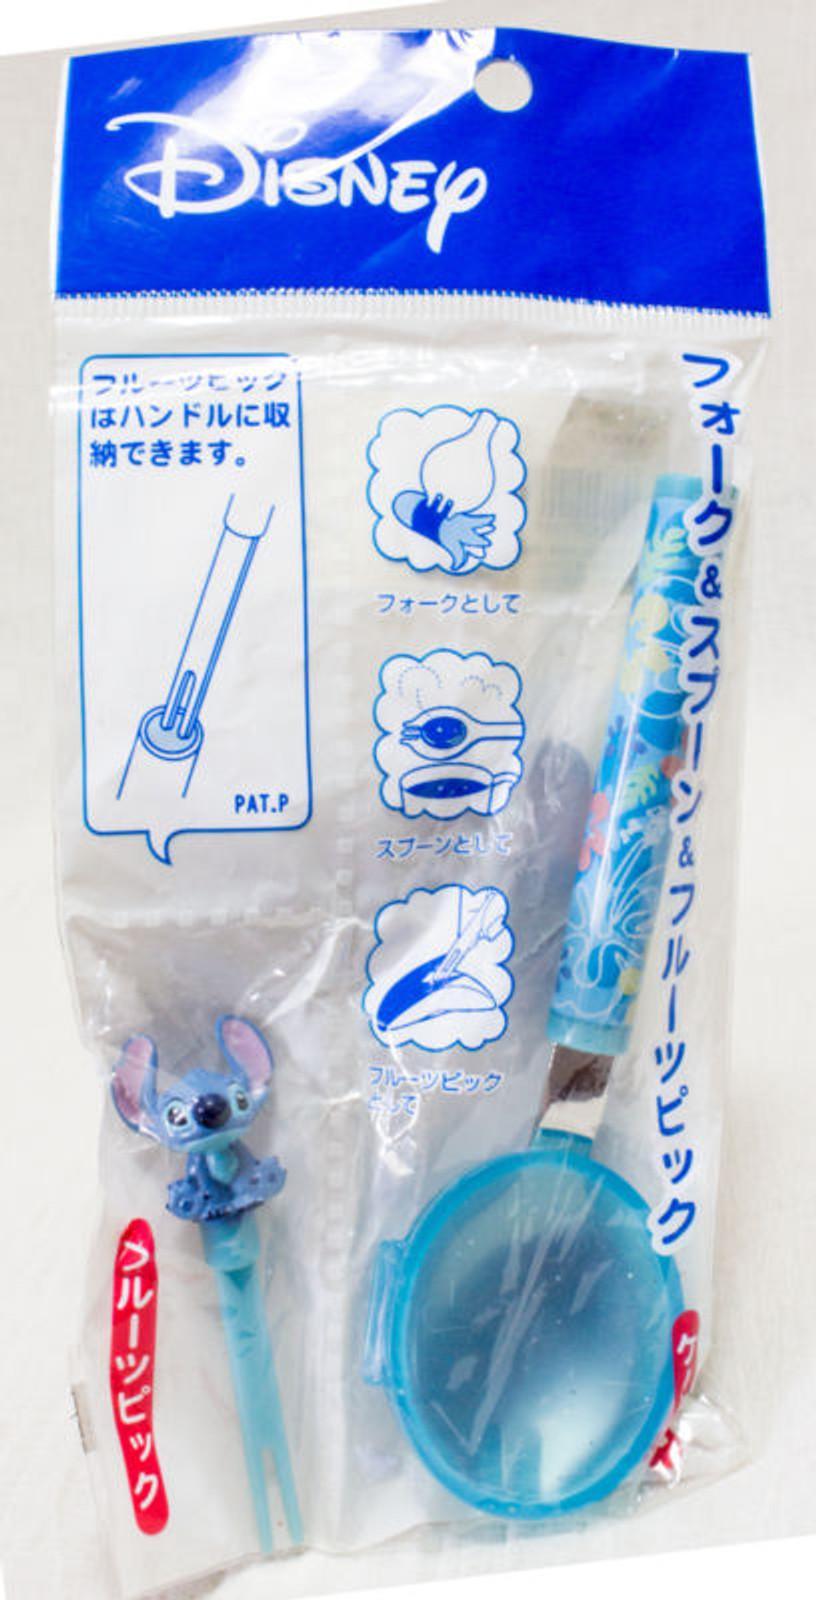 Disney Stitch Spork (Folk Spoon) & Fruits Pick JAPAN ANIME